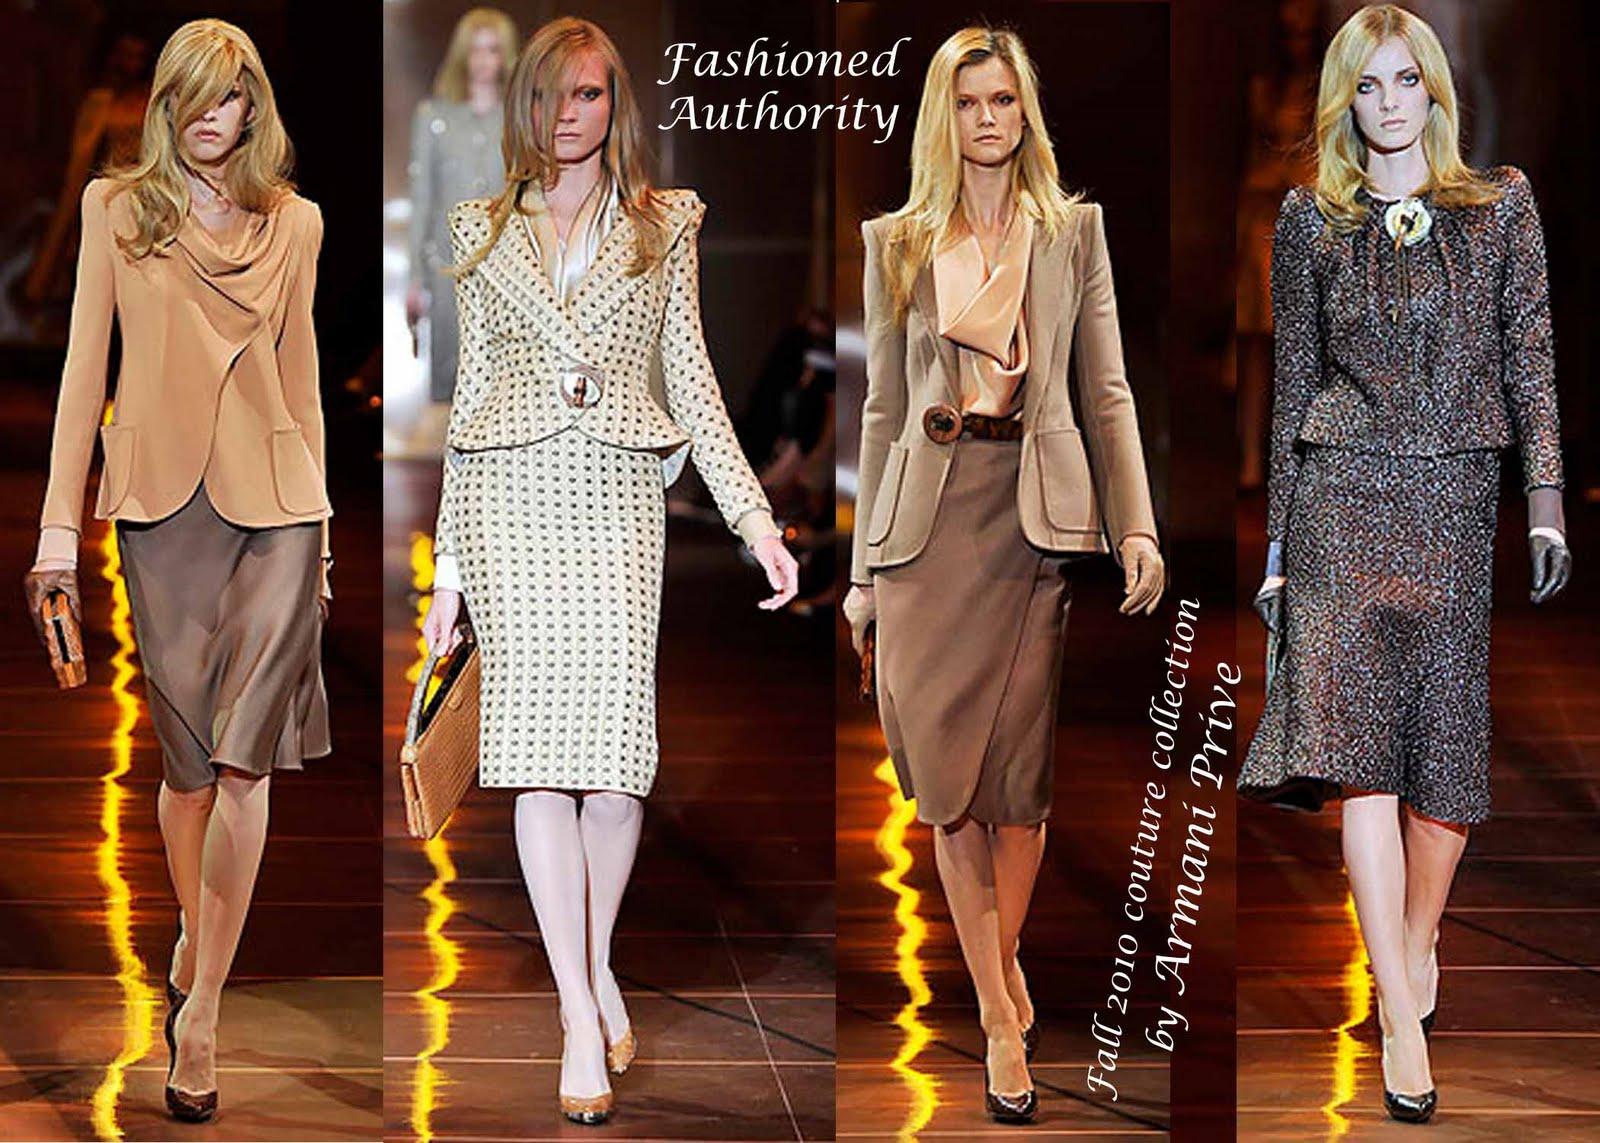 http://2.bp.blogspot.com/_c1hhRYj9kUQ/TD7pA3qaKJI/AAAAAAAAACg/fH7CIXrGoA4/s1600/Armani+Prive+-+fashioned+authority+skirt.jpg